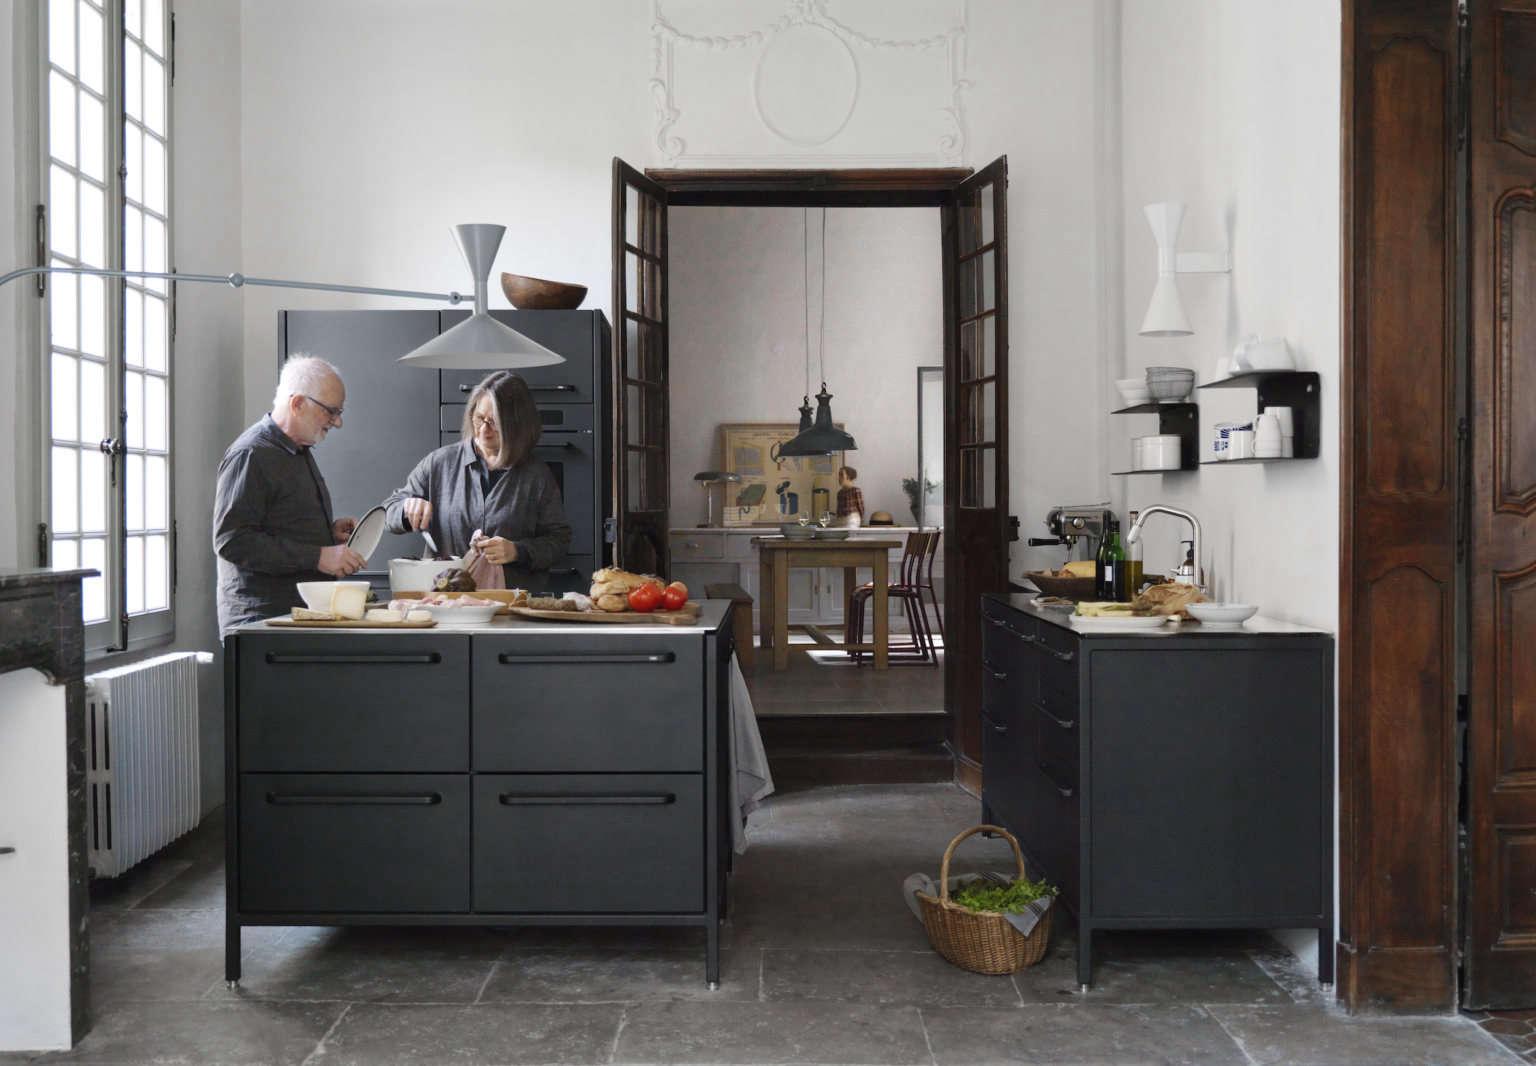 lone chris mccarter vipp townhouse uzes kitchen5 1536x1066